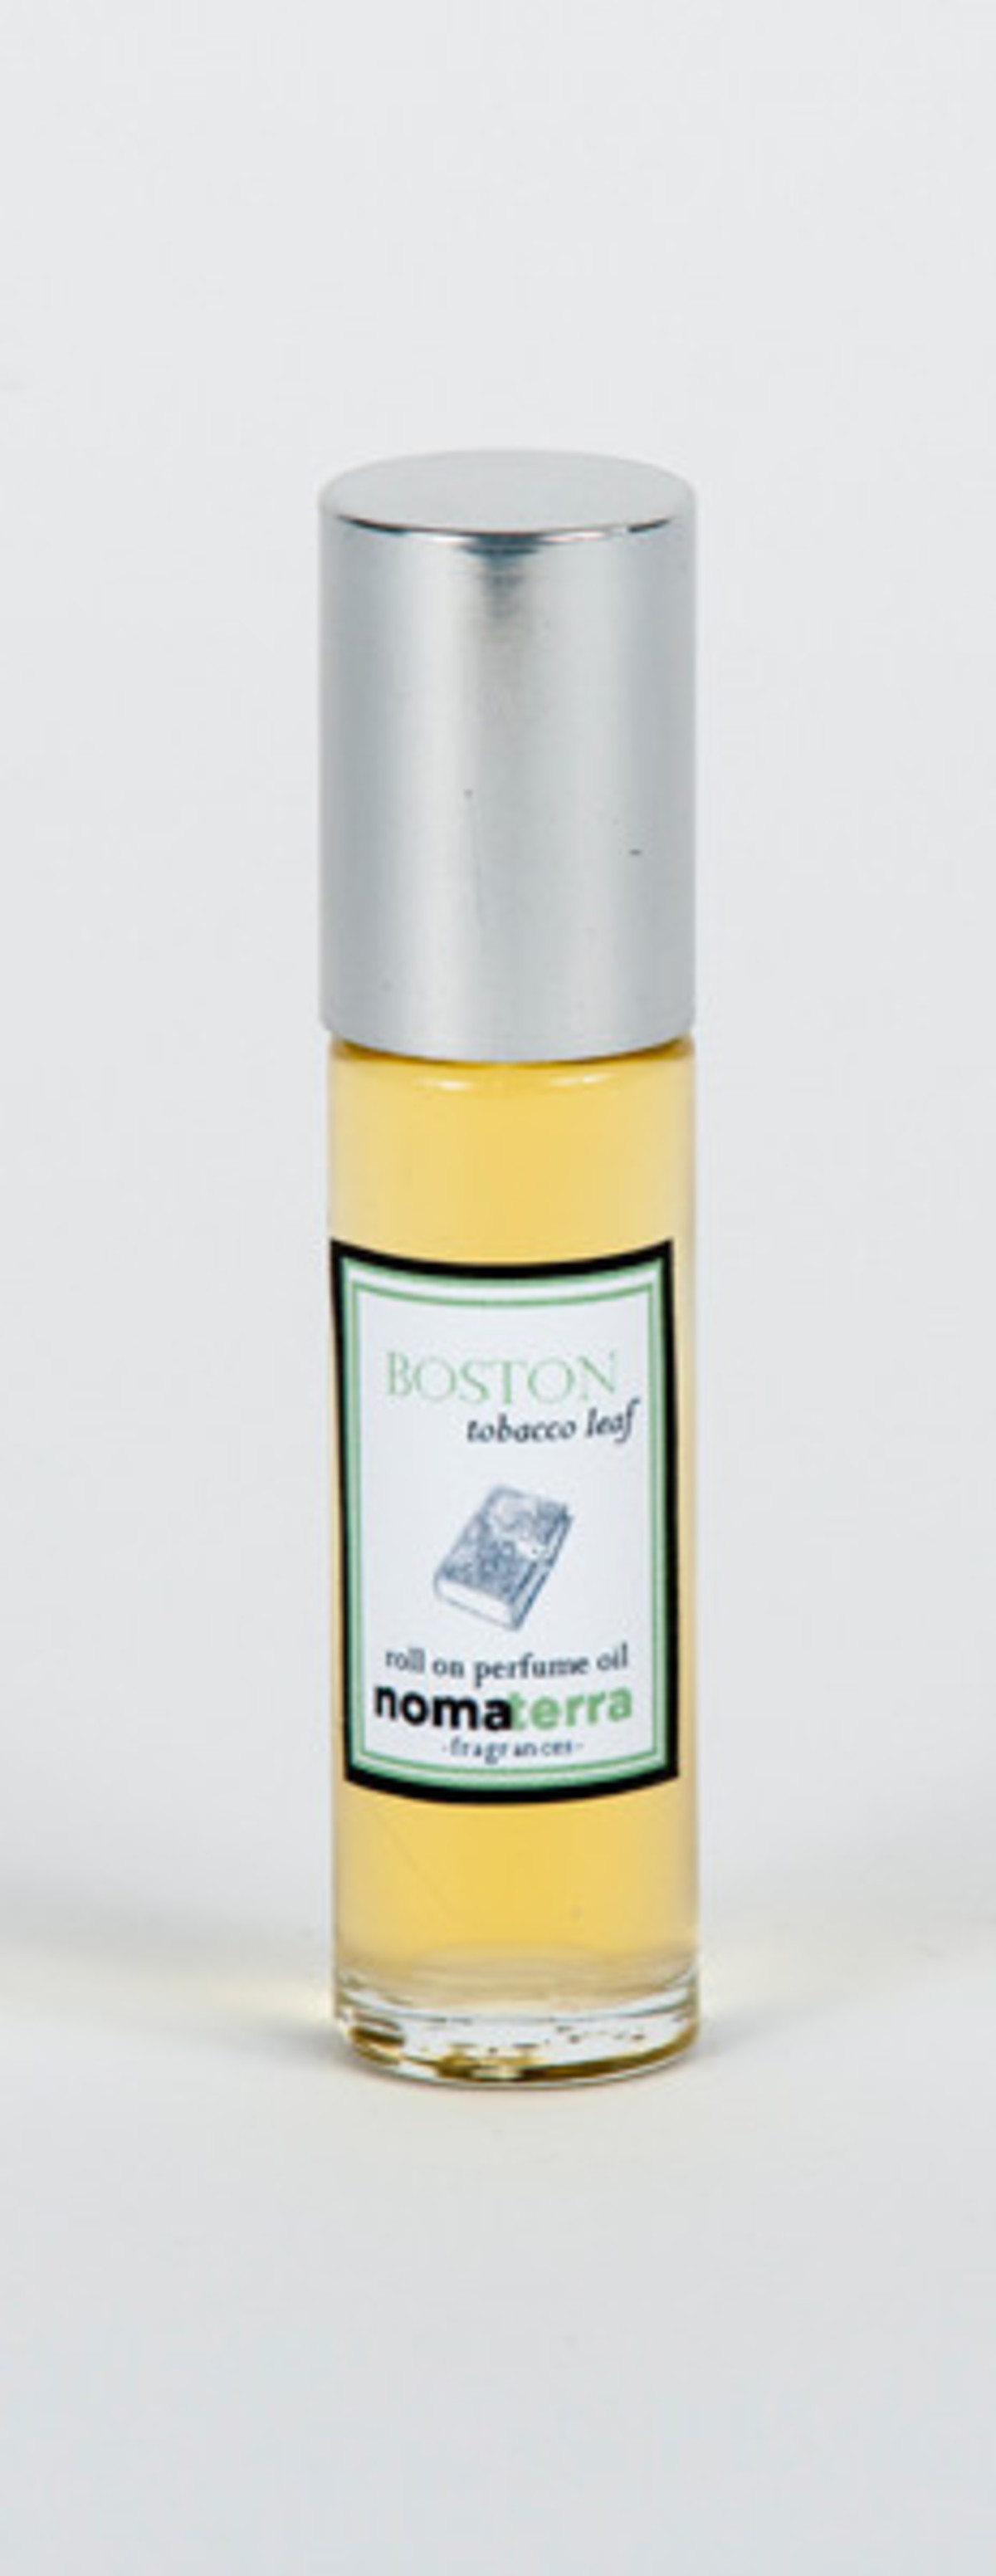 Nomaterra - Boston Tobacco Leaf Roll On Perfume